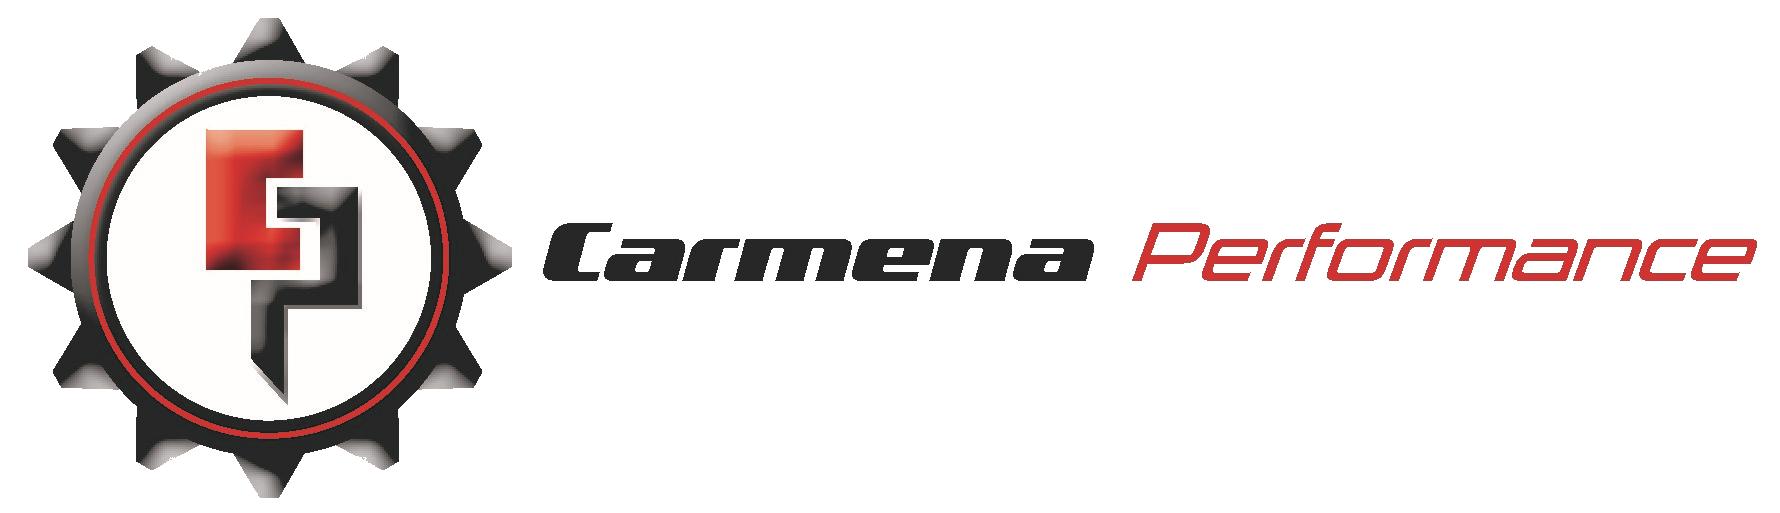 Carmena Performance